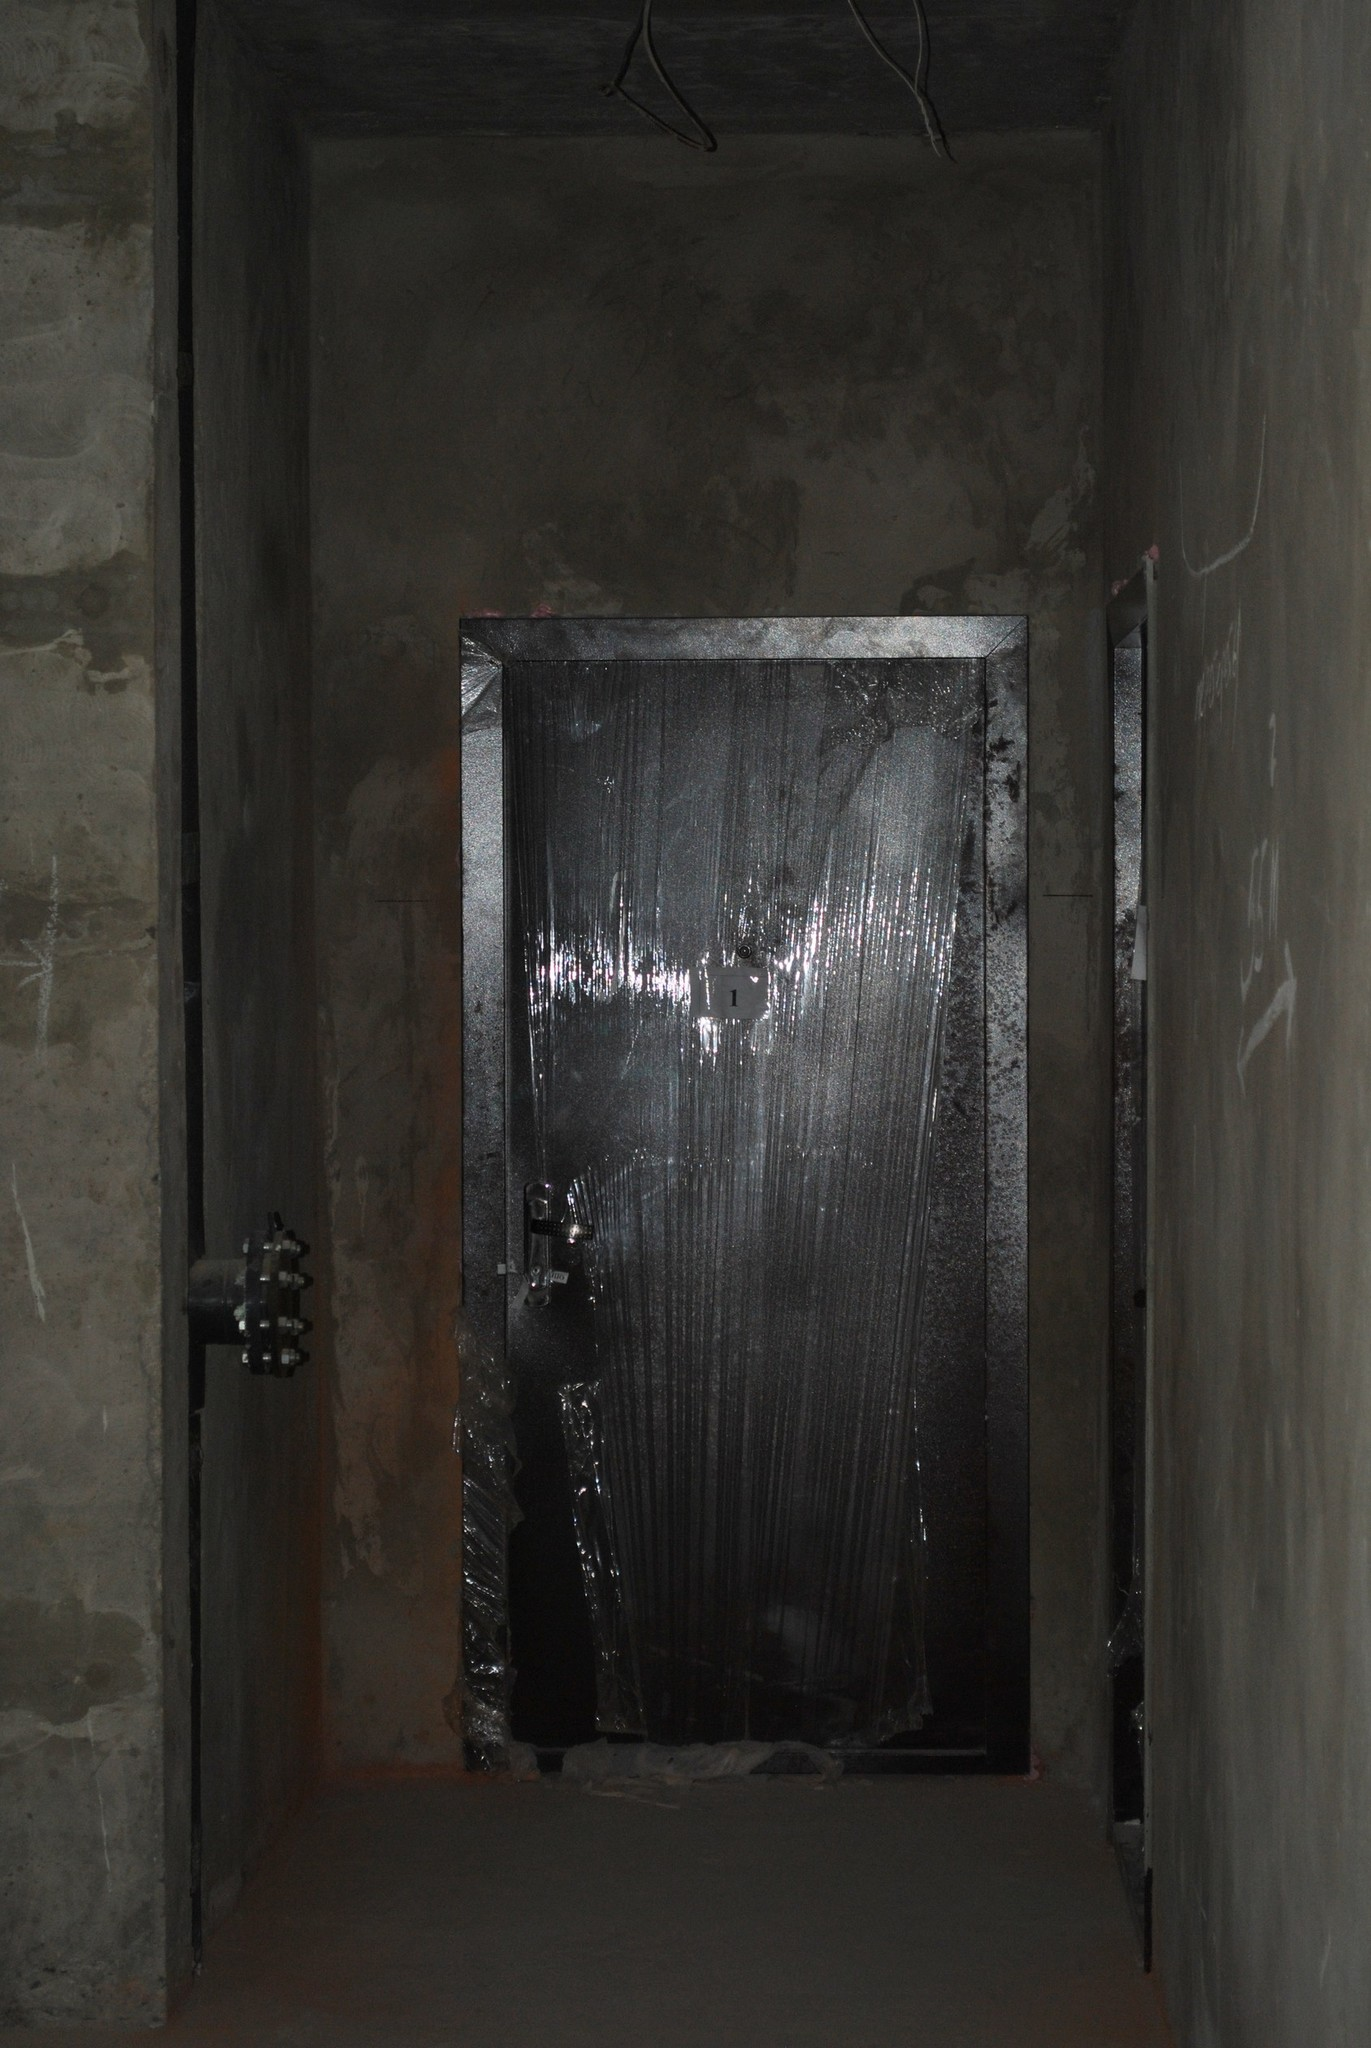 h-1118.jpg